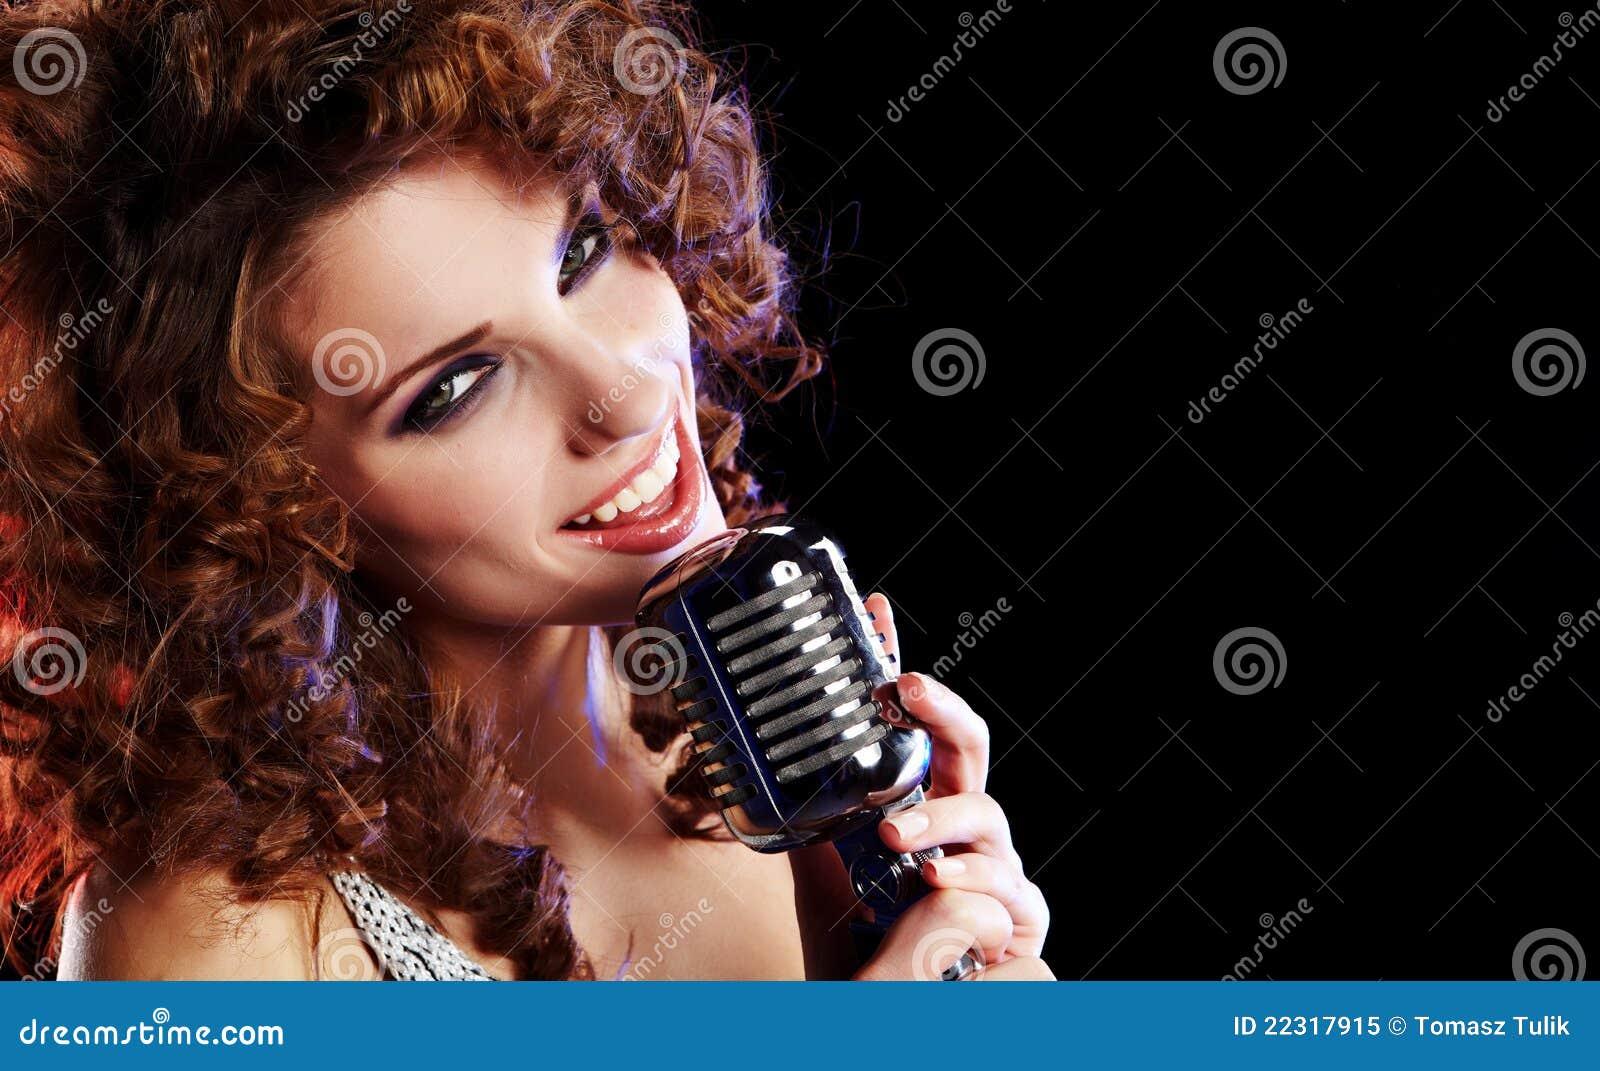 singing the girl retro - photo #1